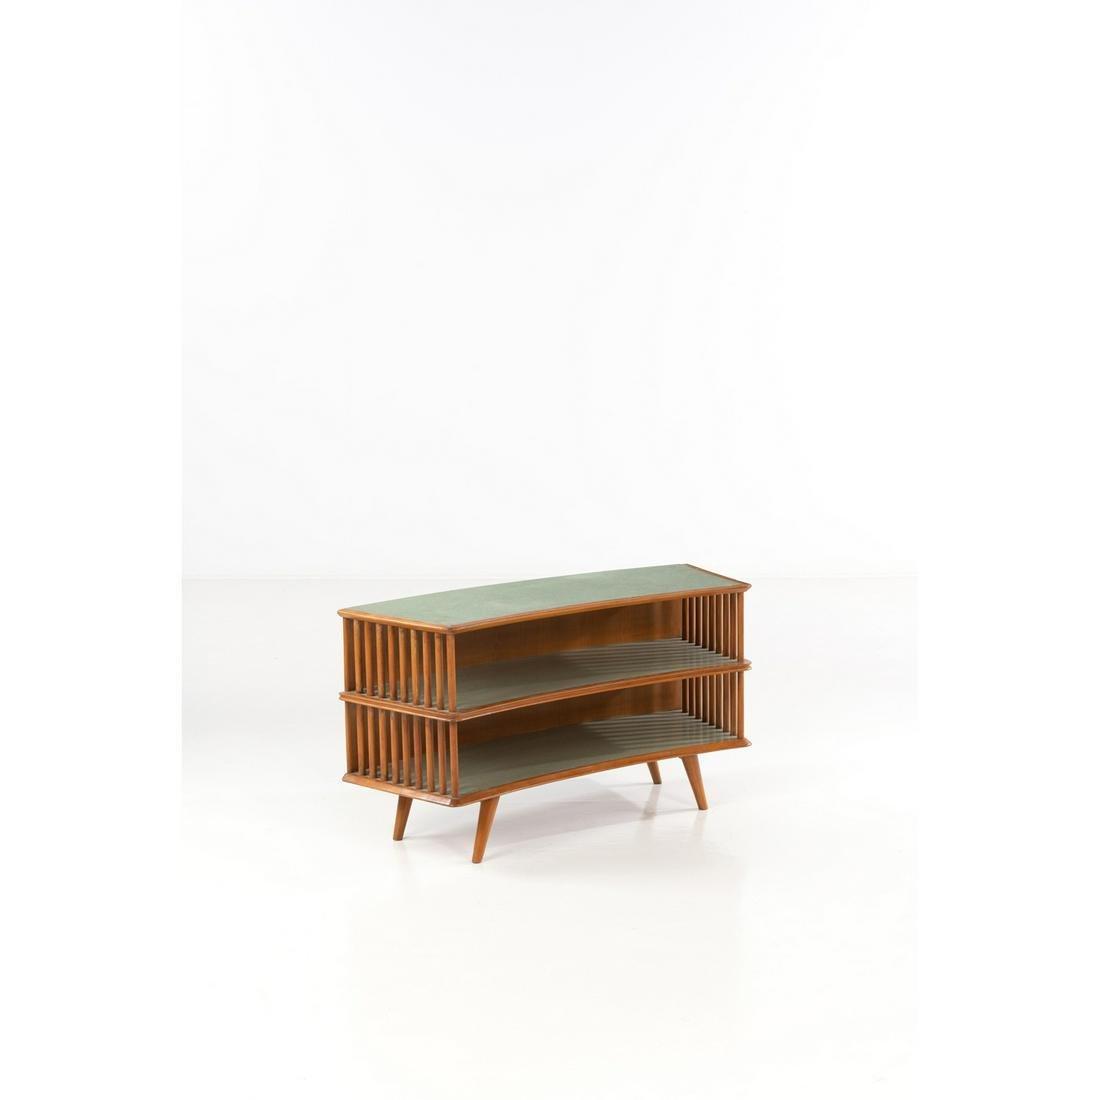 Joaquim Tenreiro (1906-1992) Low bookcase